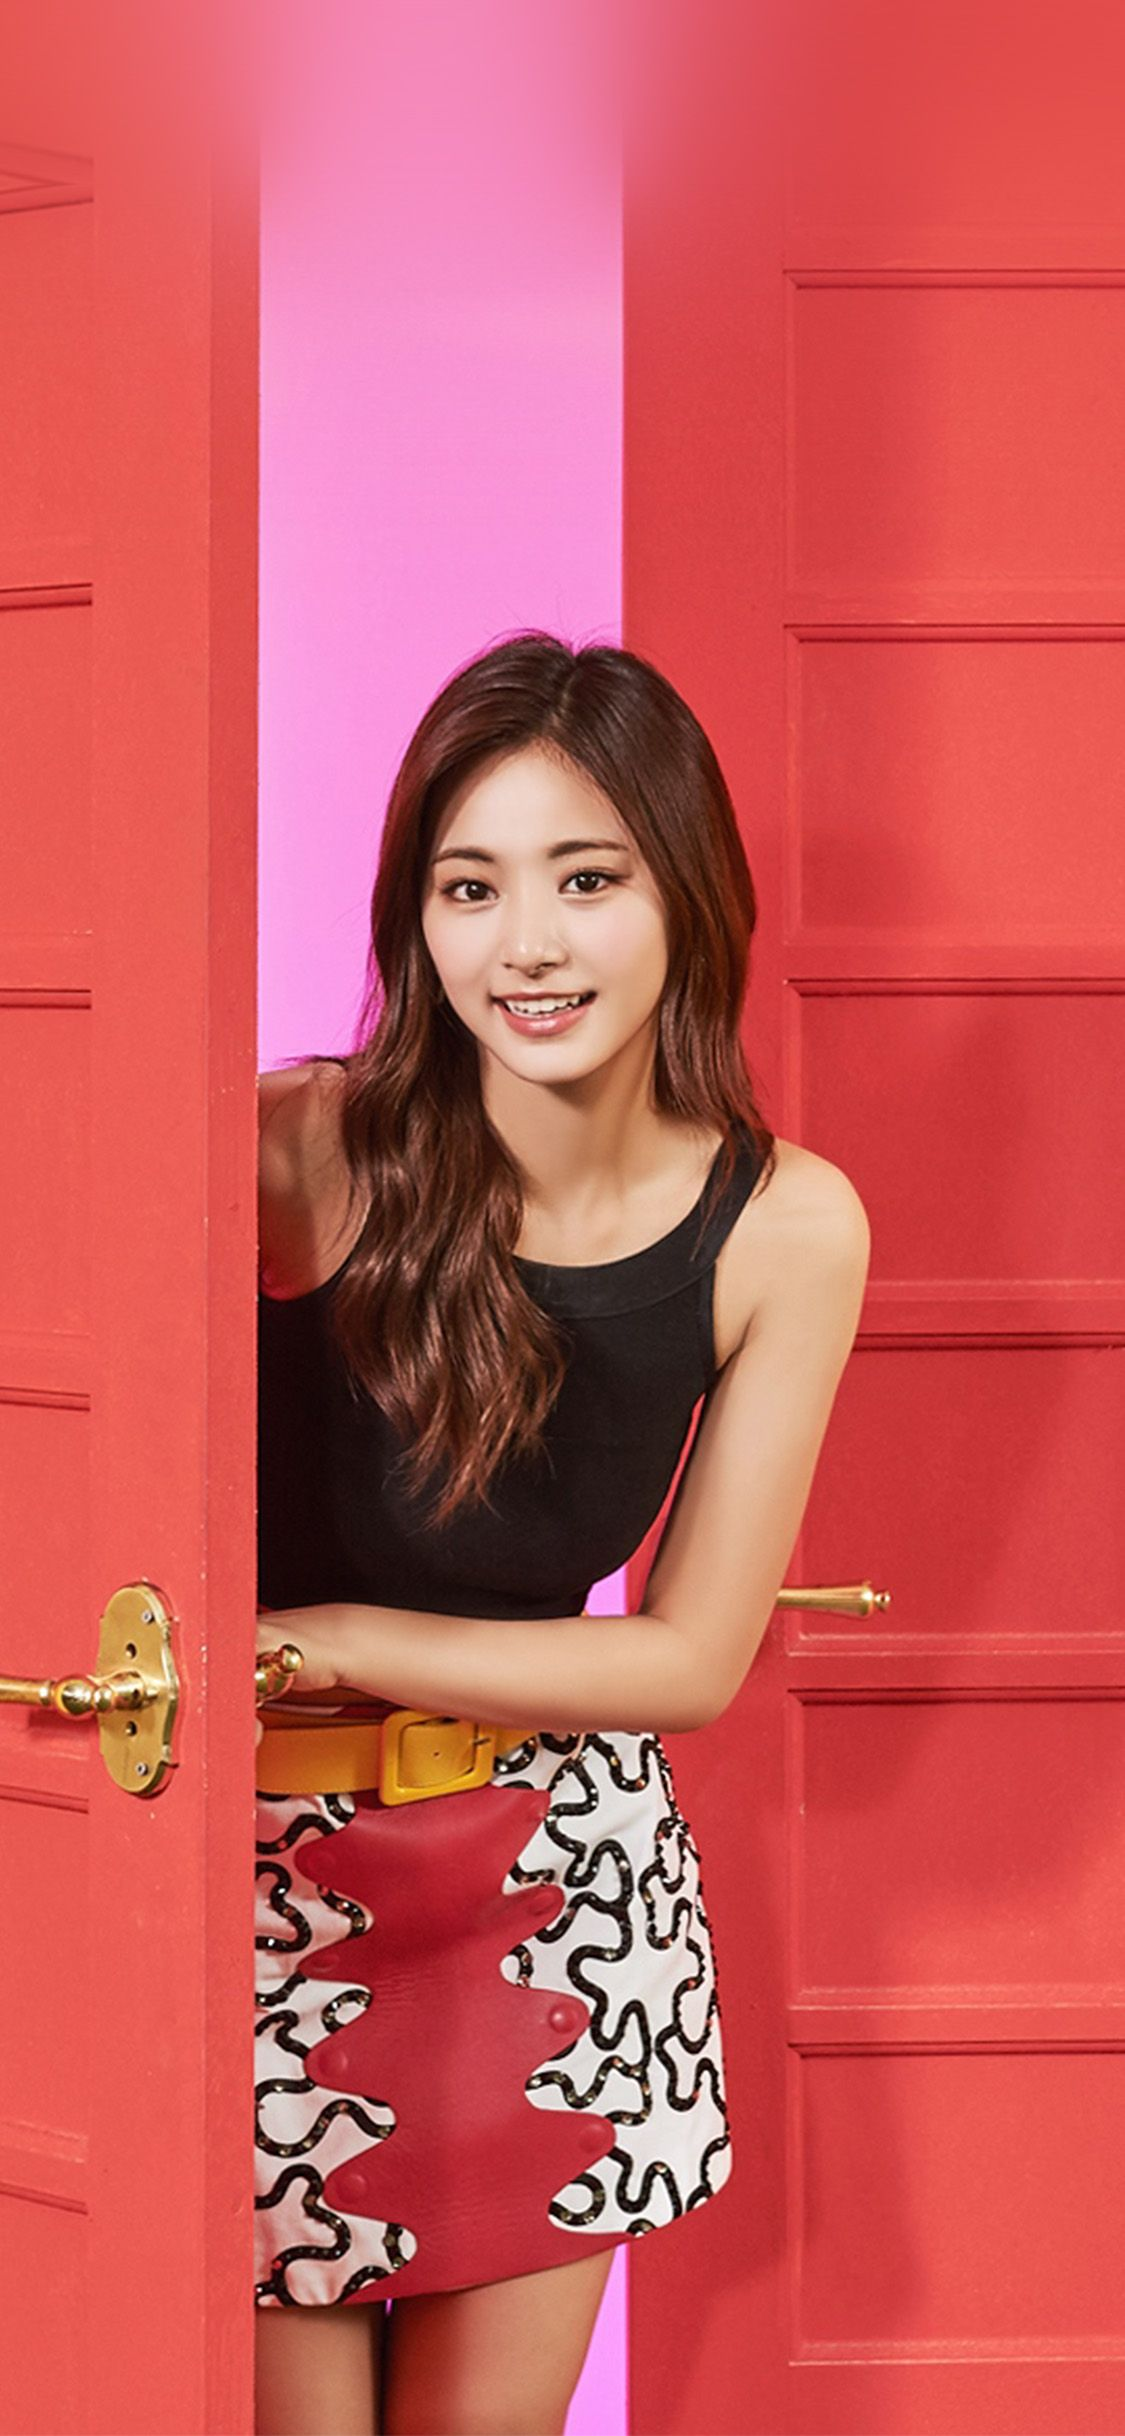 Hq27 Twice Girl Tzuyu Red Music Kpop Aisan Via Http